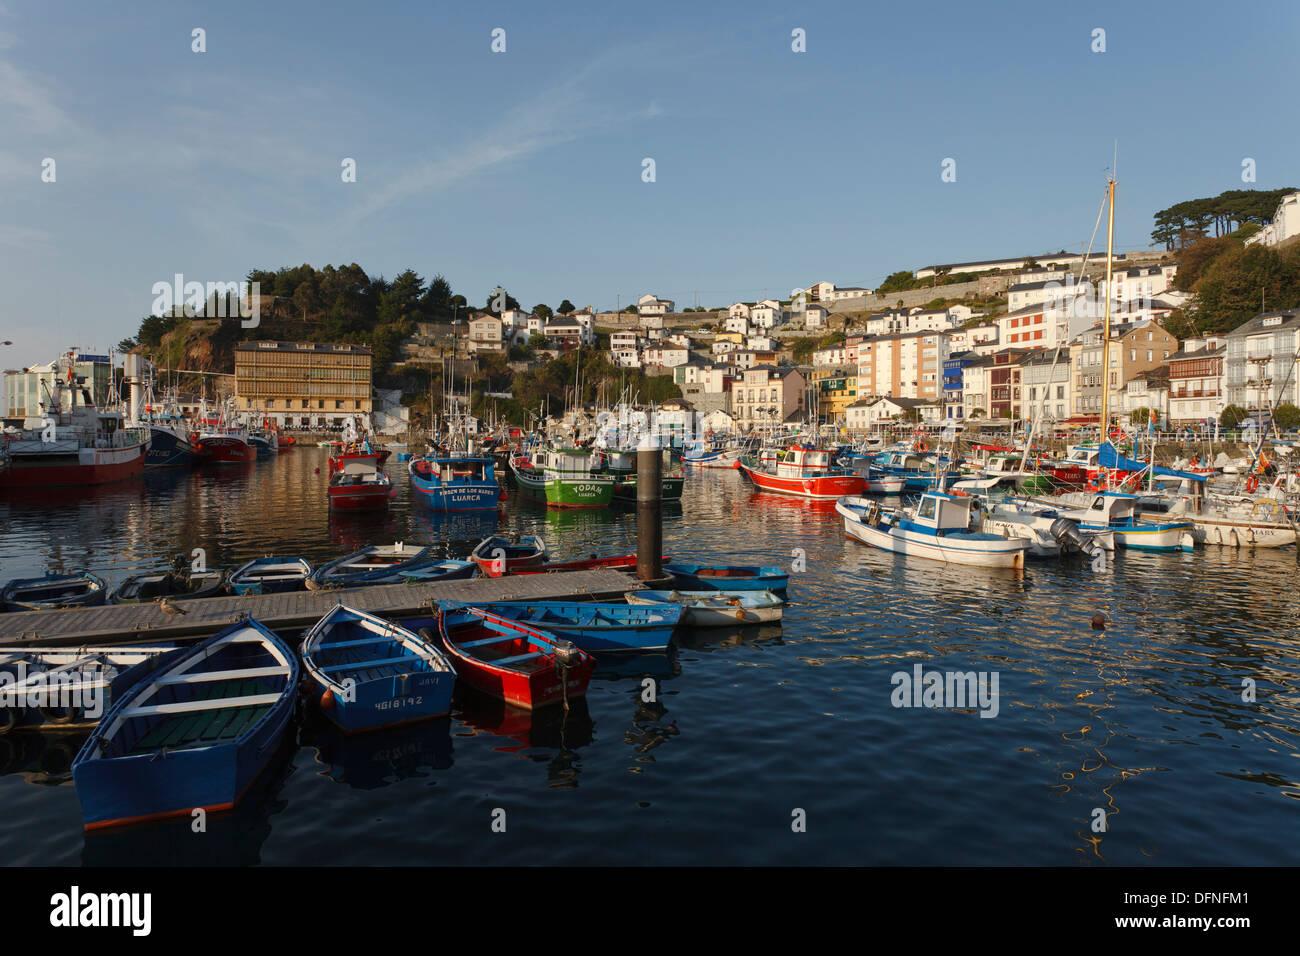 Luarca, seaside town, fishing boats, fishing port, Camino de la Costa, Camino del Norte, coastal route, Way of St. James, Camino - Stock Image